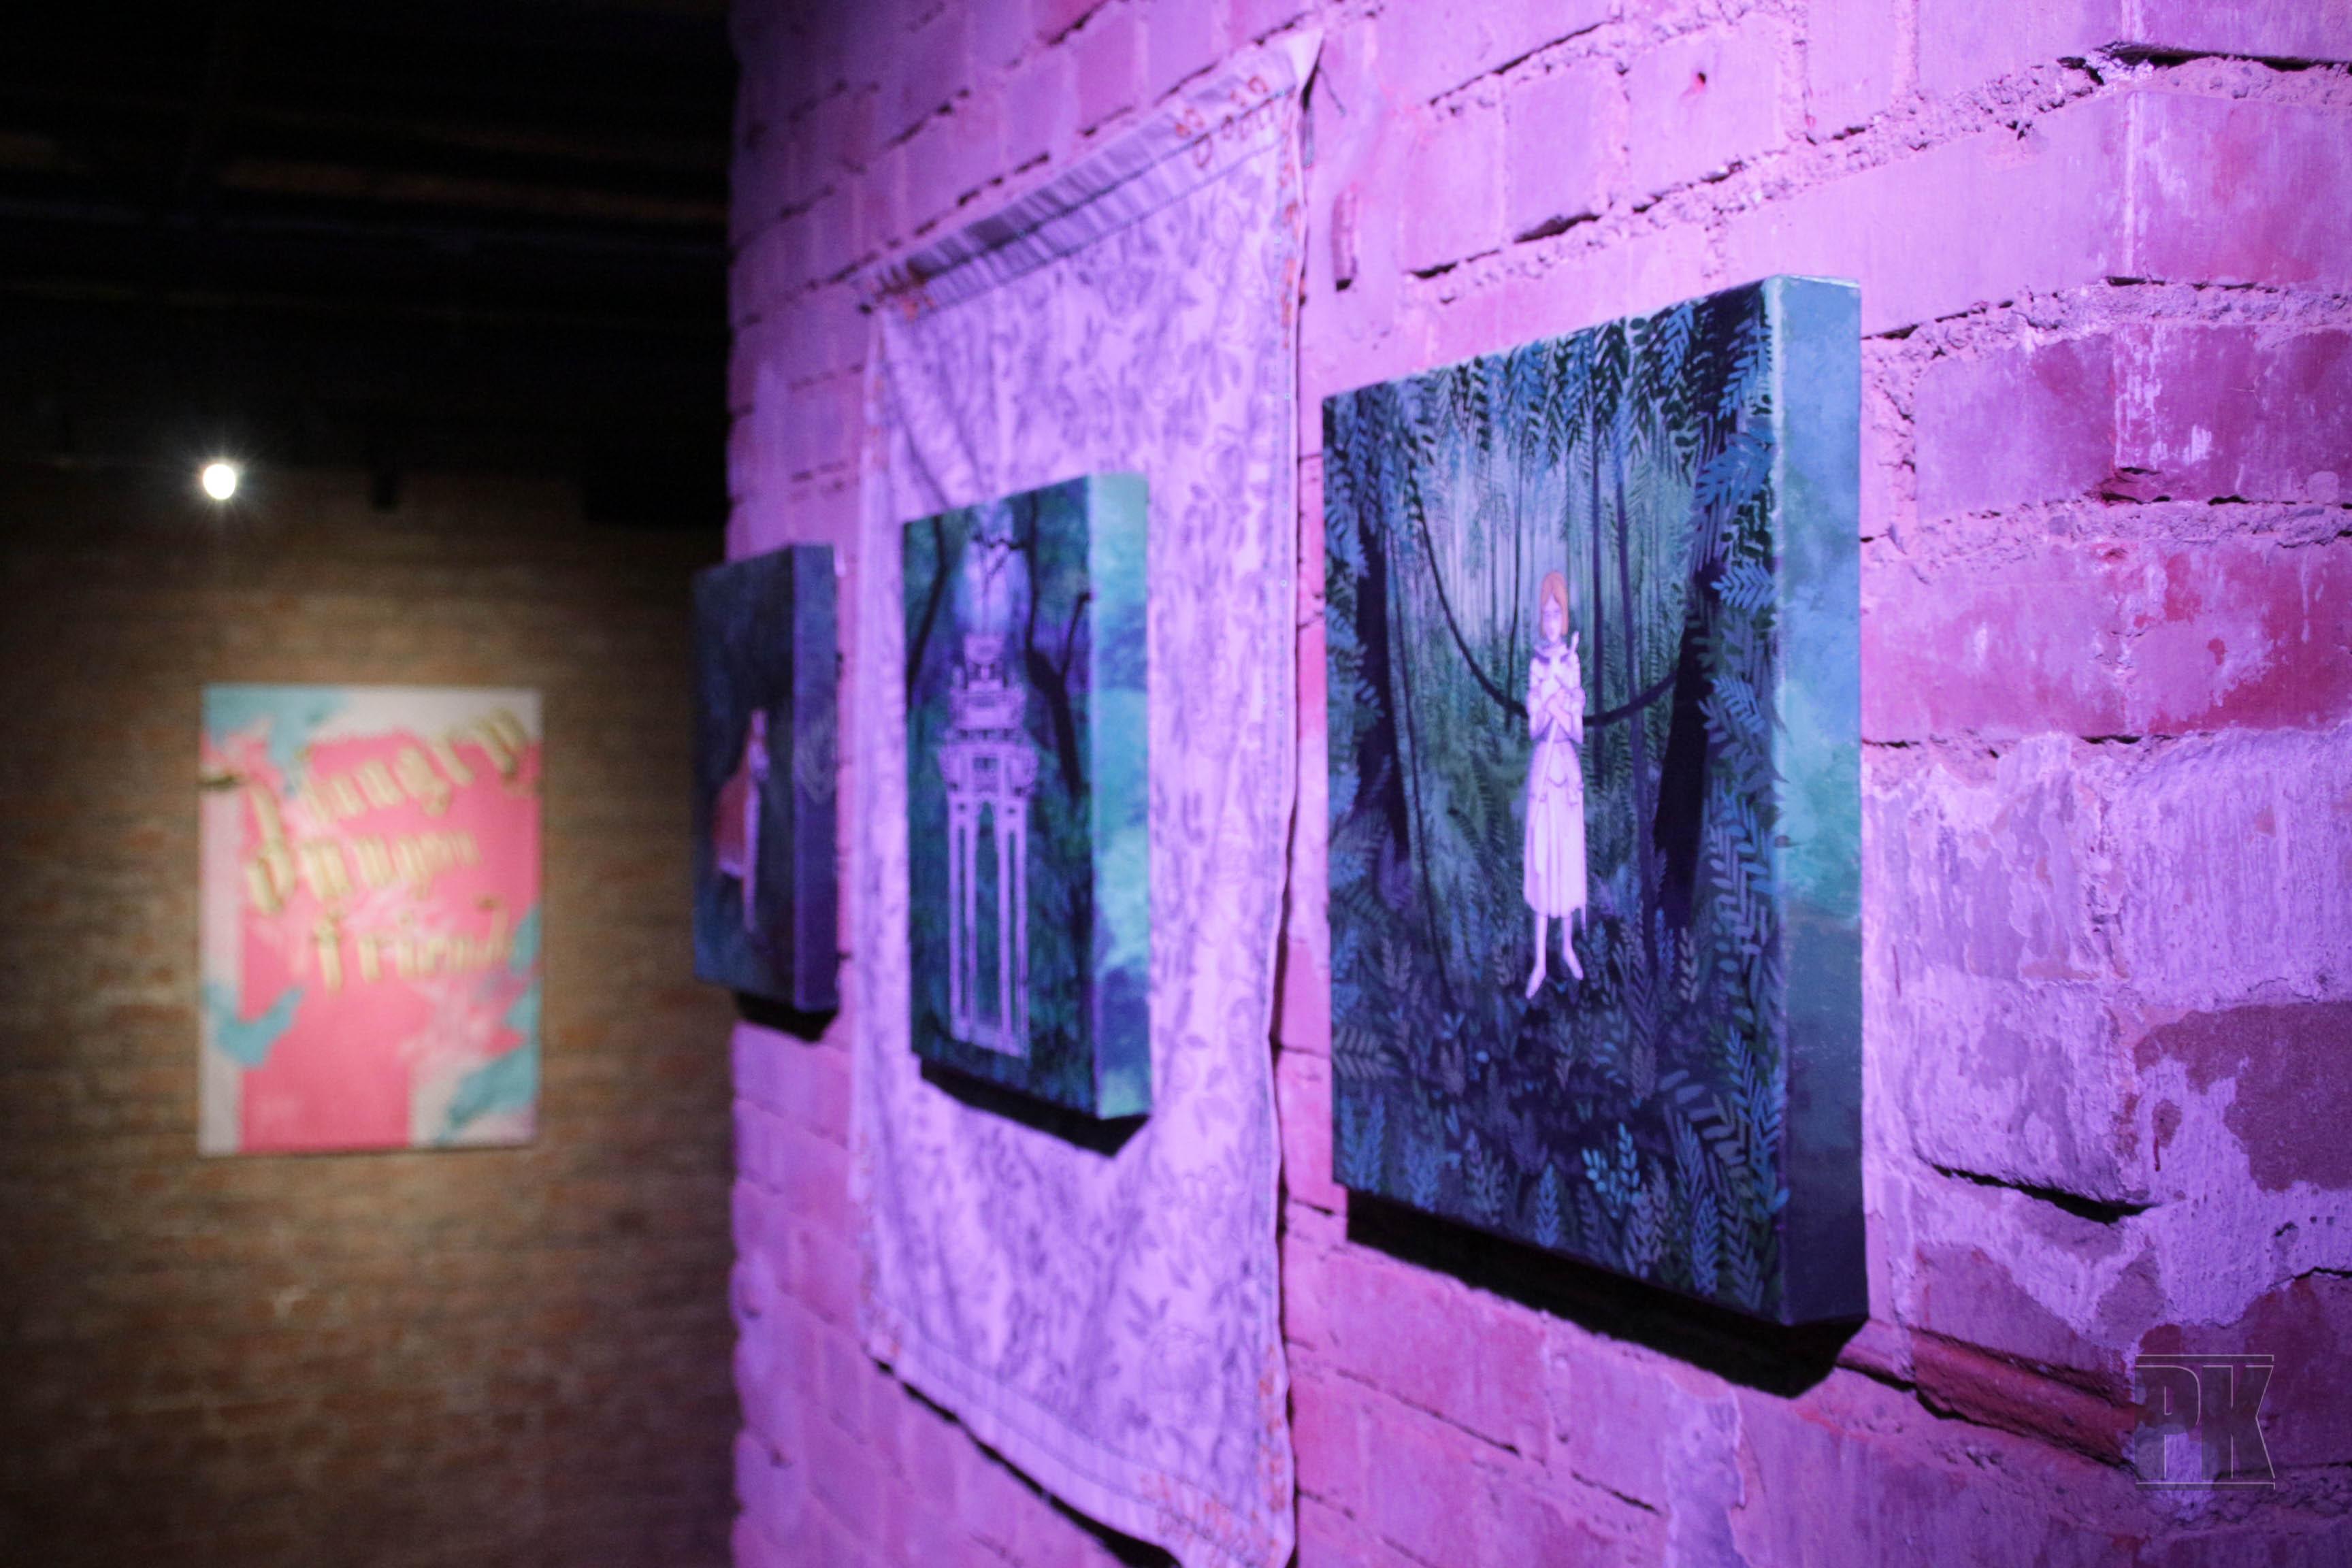 artist-work-Hungry-Dungeon-Friends-installation-view-PILOTENUECHE-International-Art-Program-at-KUNSTKRAFTWERK.-photo-Stanley-Louis-for-PK-38